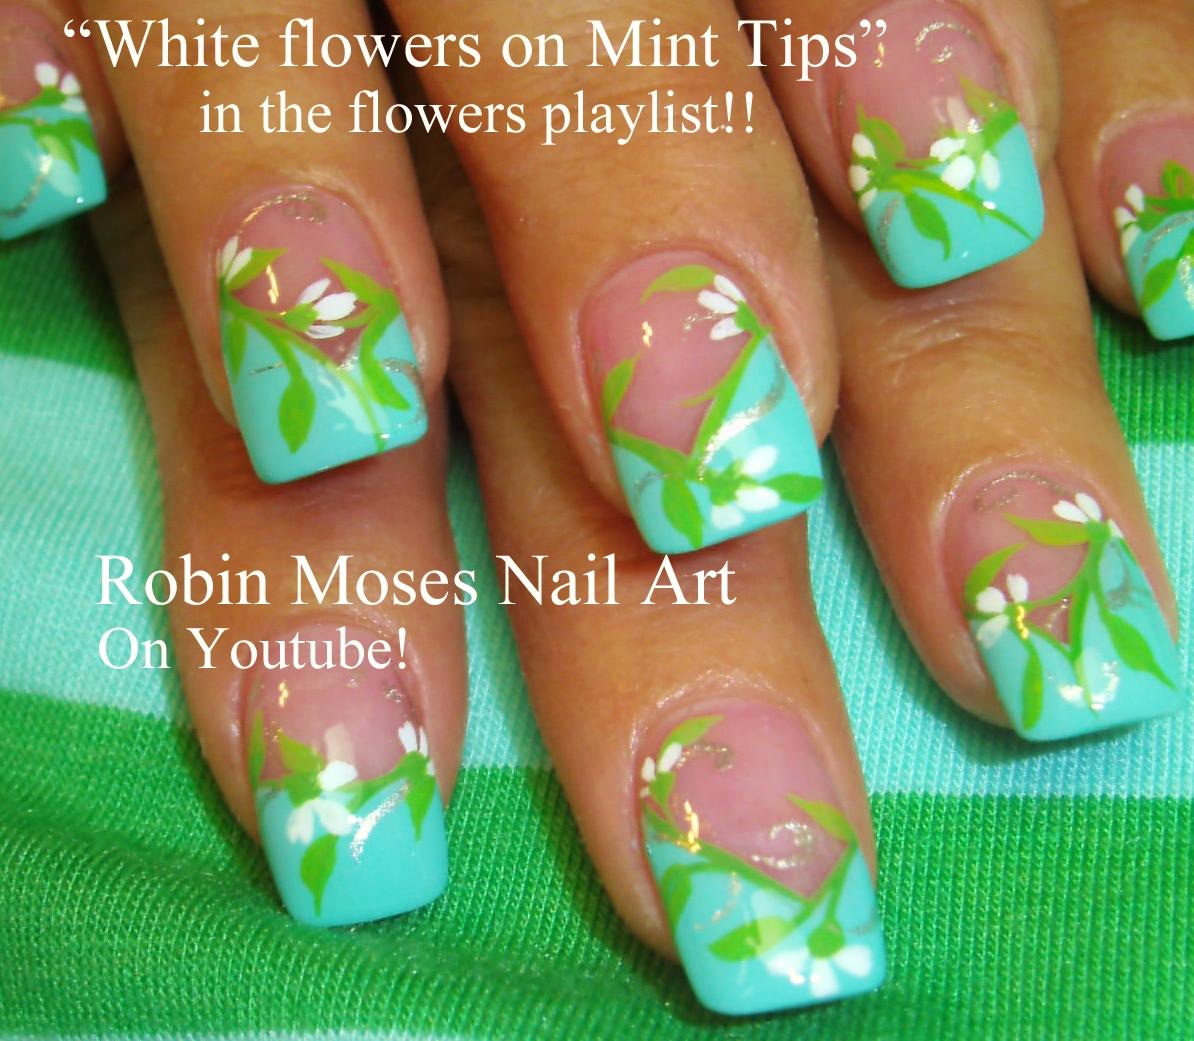 Robin Moses Nail Art February 2015: Robin Moses Nail Art: #mintmani And Announcement Of Brush